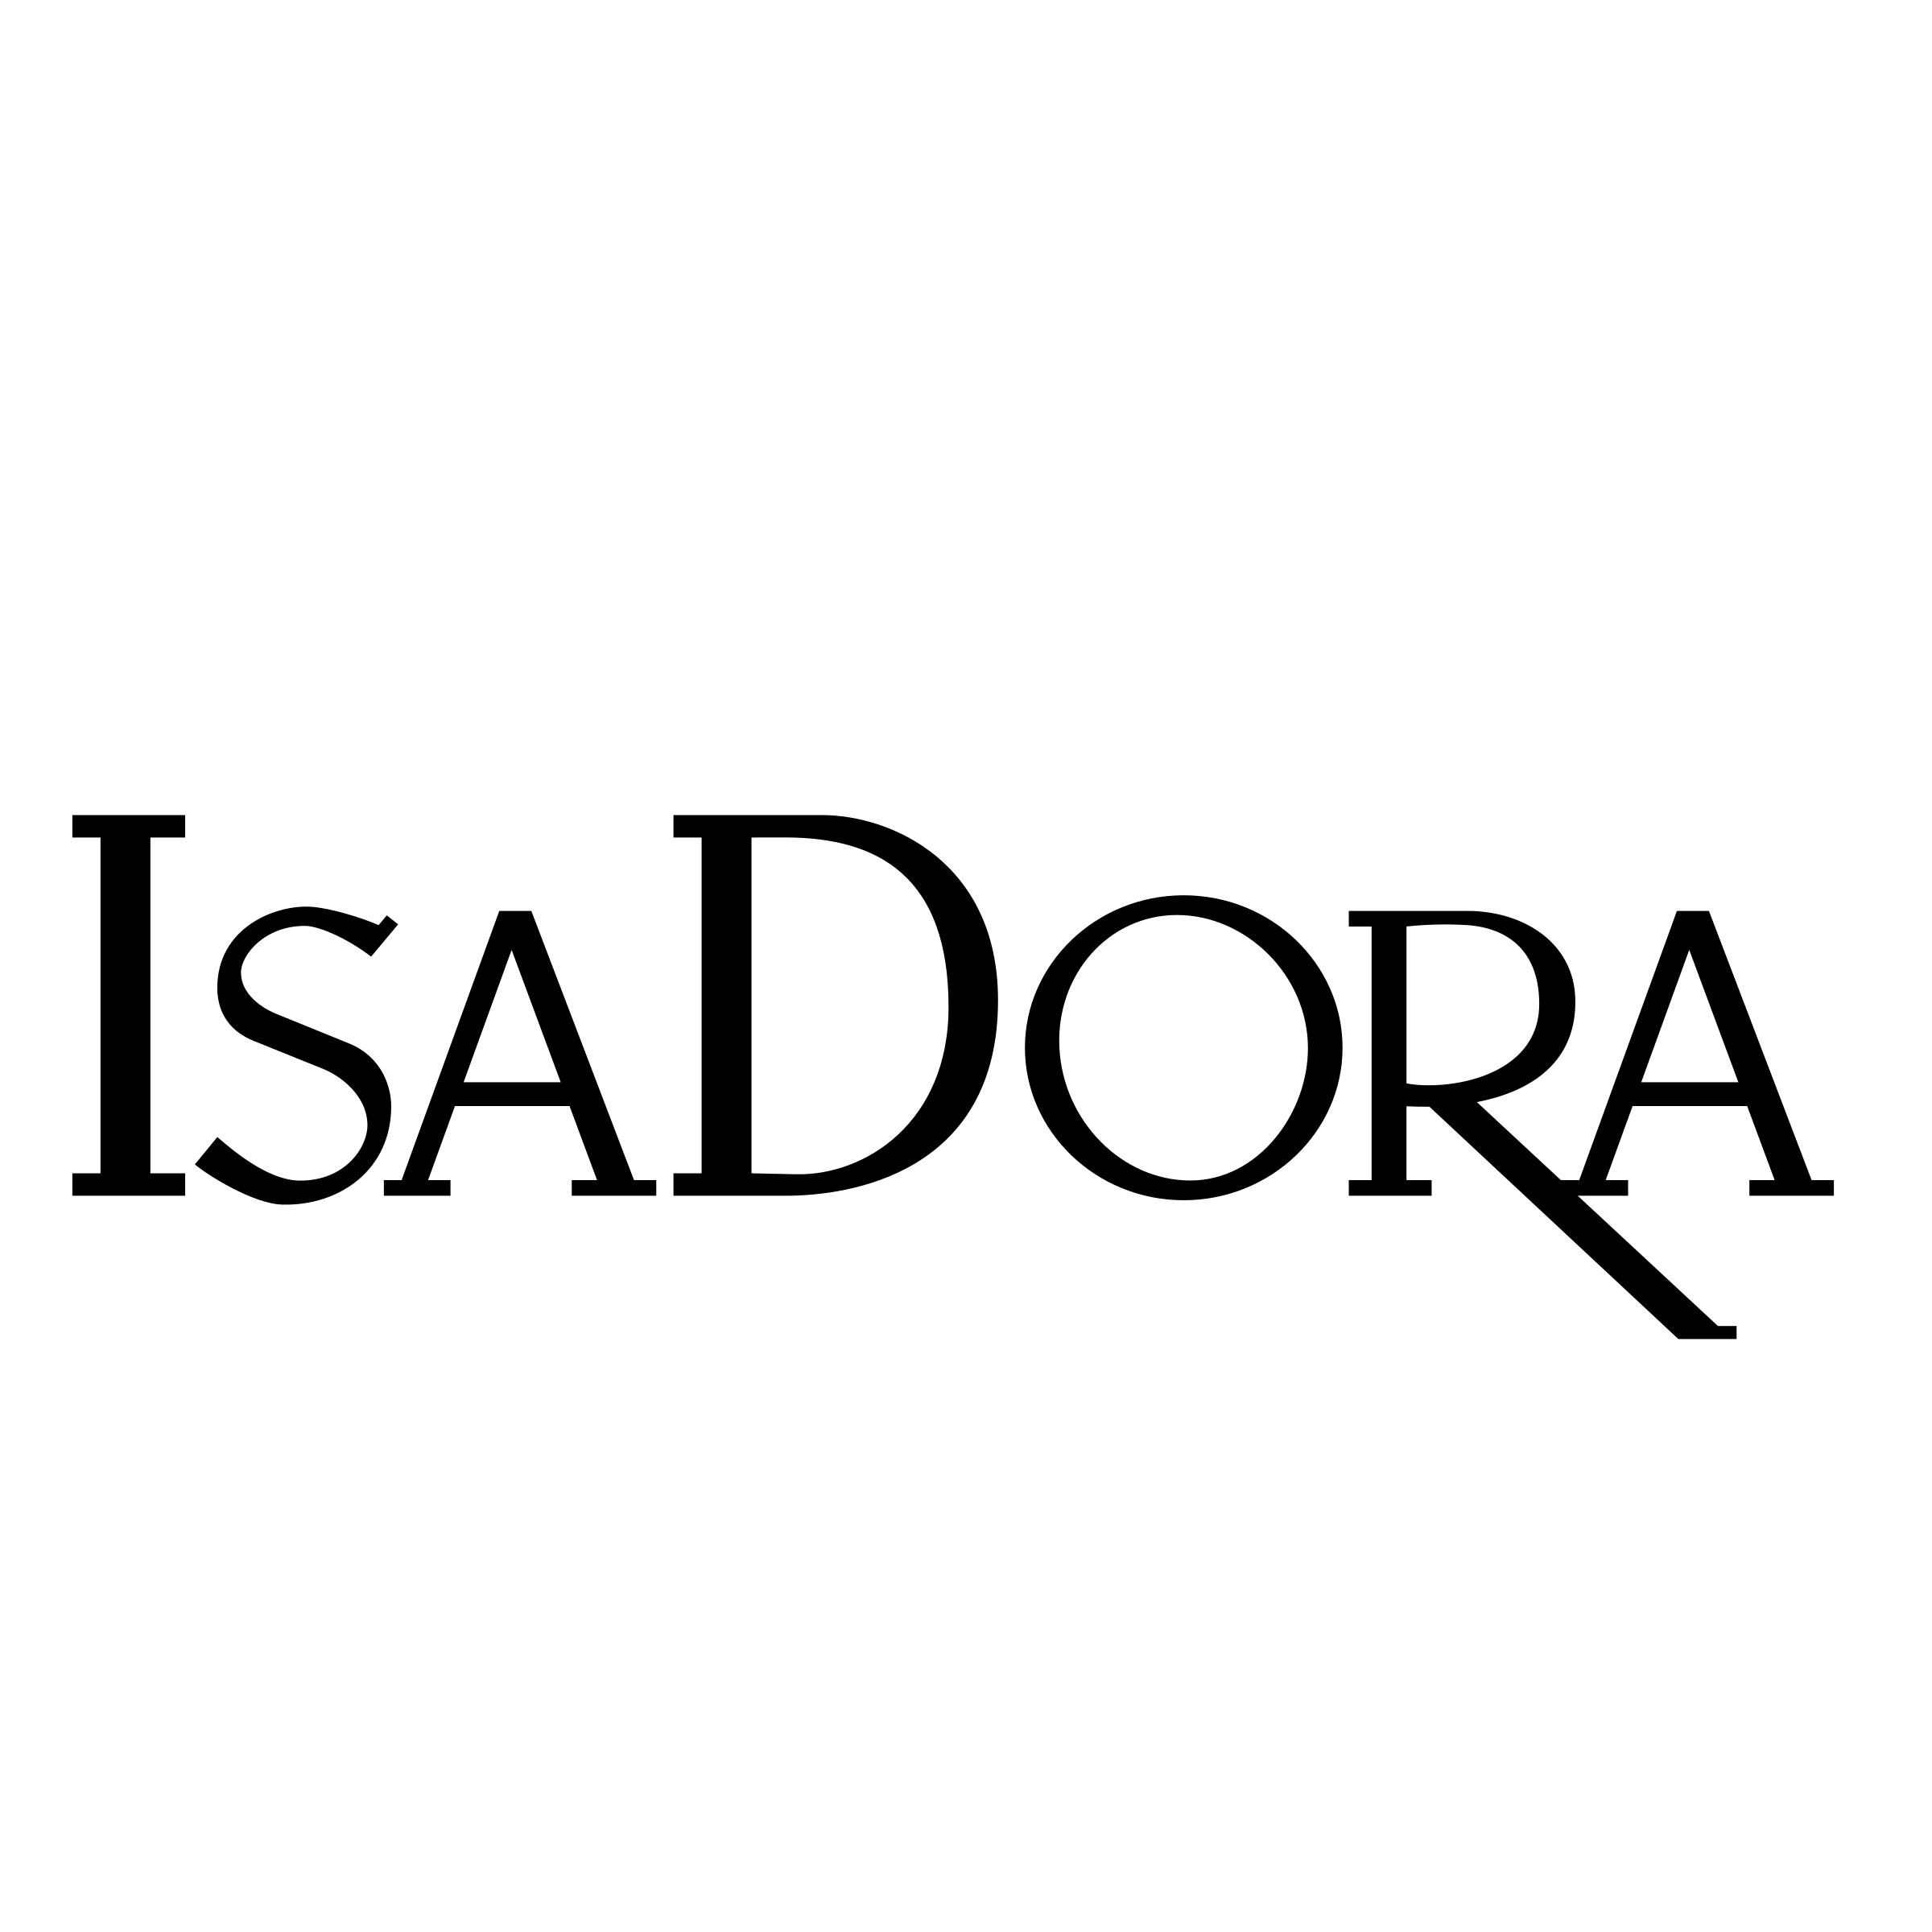 isadora-logo-png-transparent